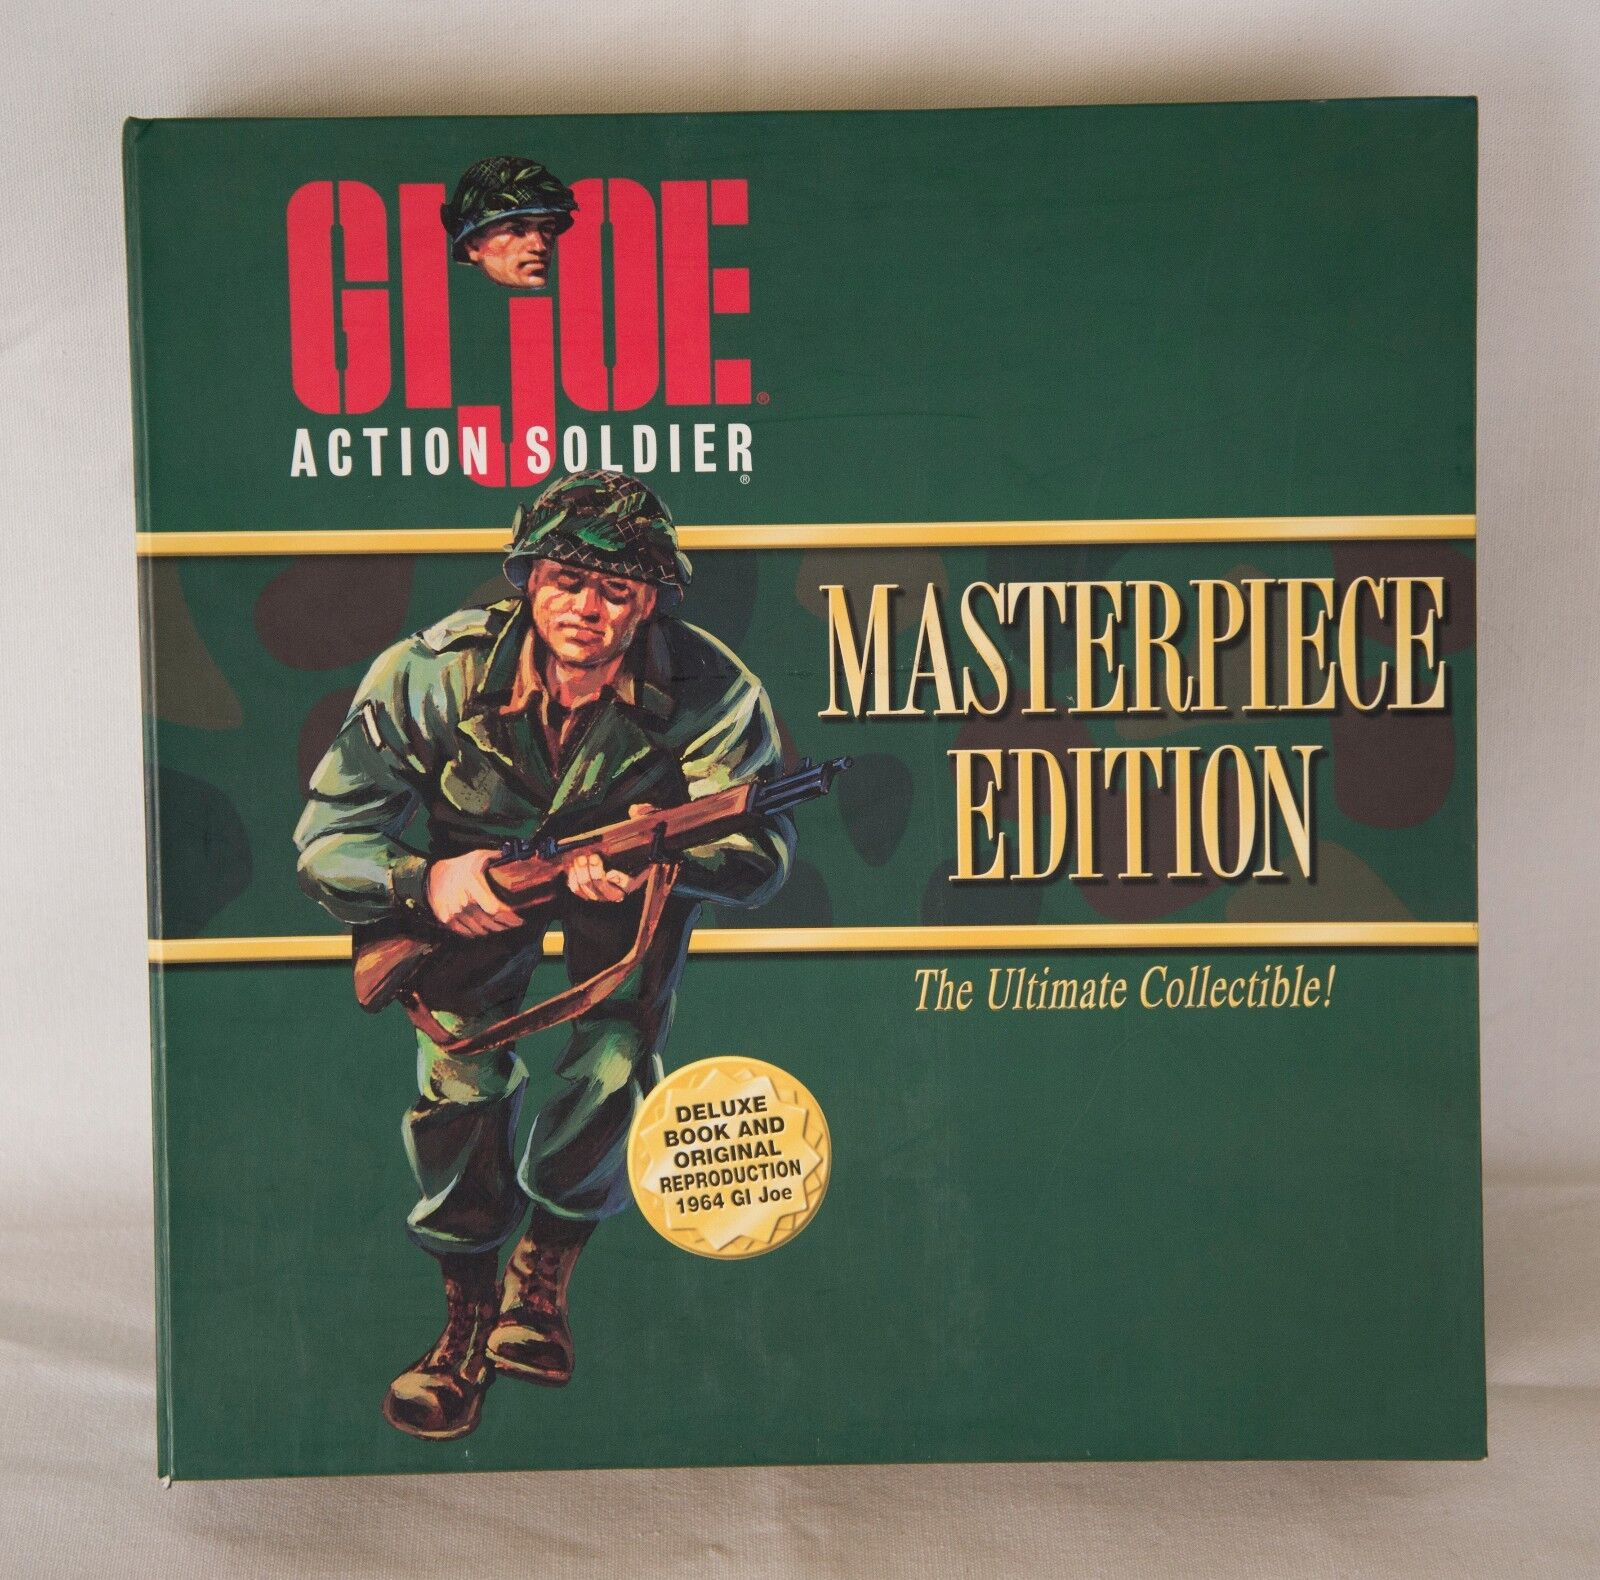 1996 gi joe meisterwerk ausgabe aktion soldat 12  abbildung & buch nib